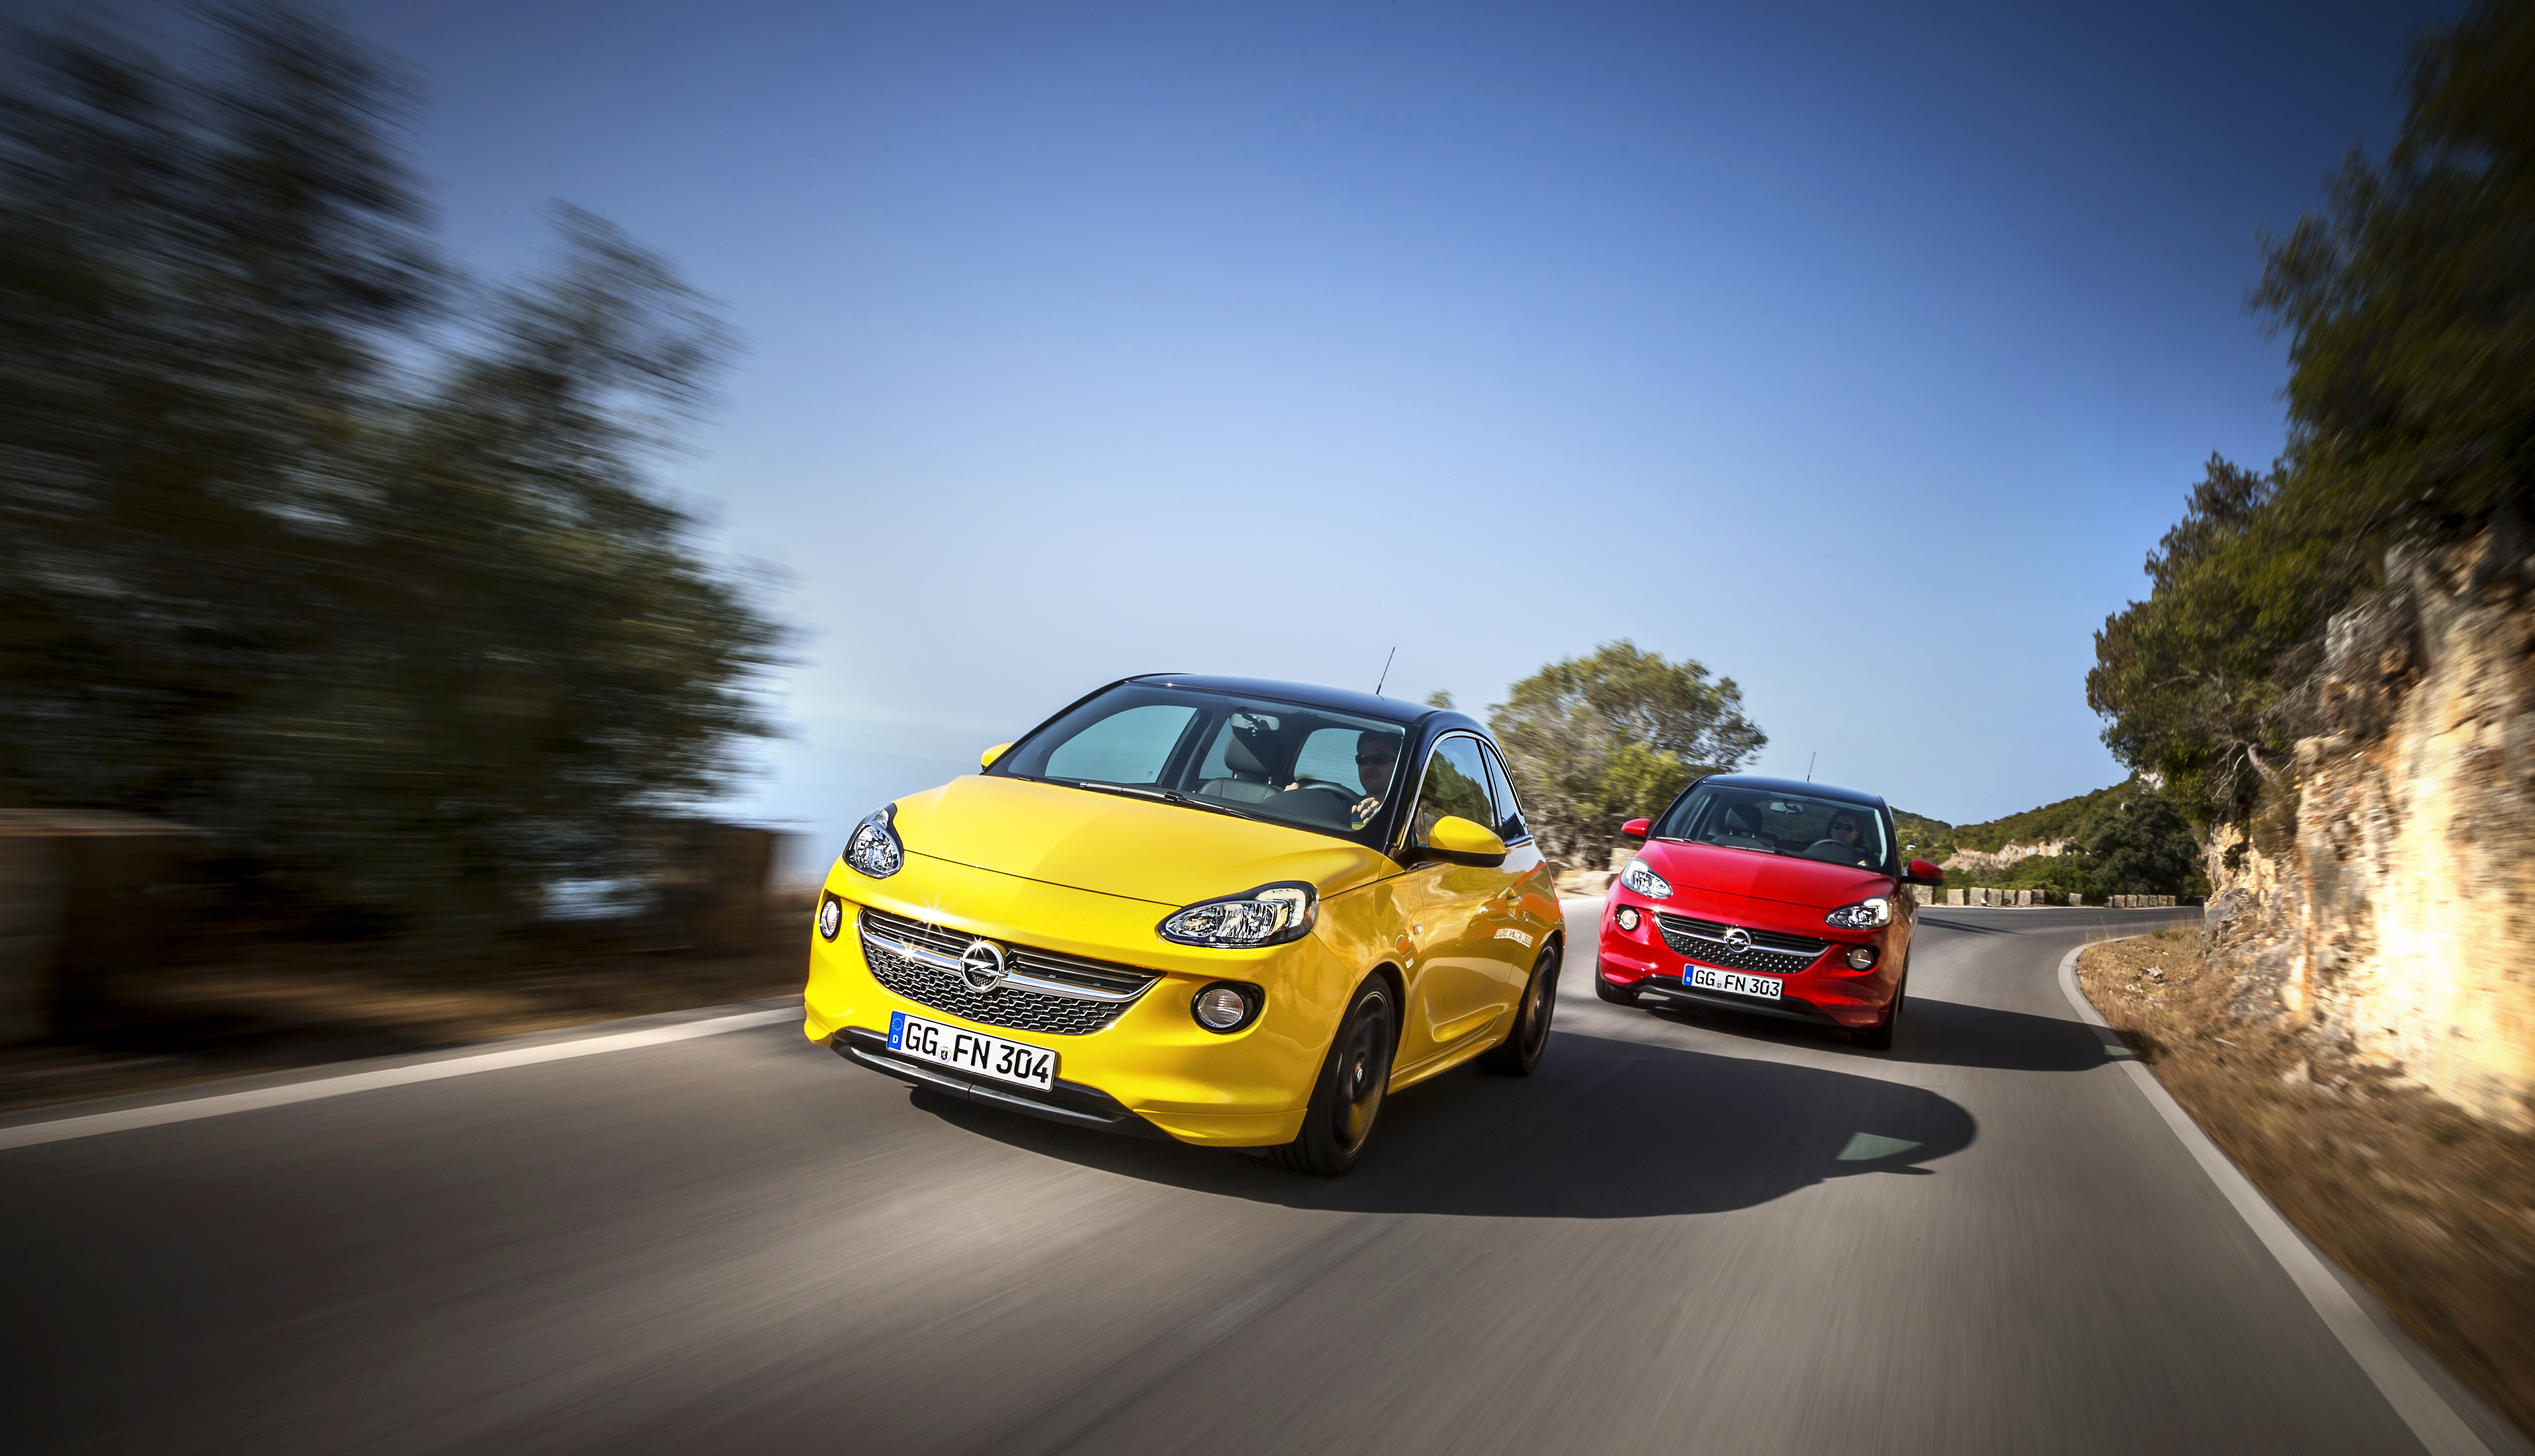 A Opel ADAM il secondo 'AutoTrophy' consecutivo